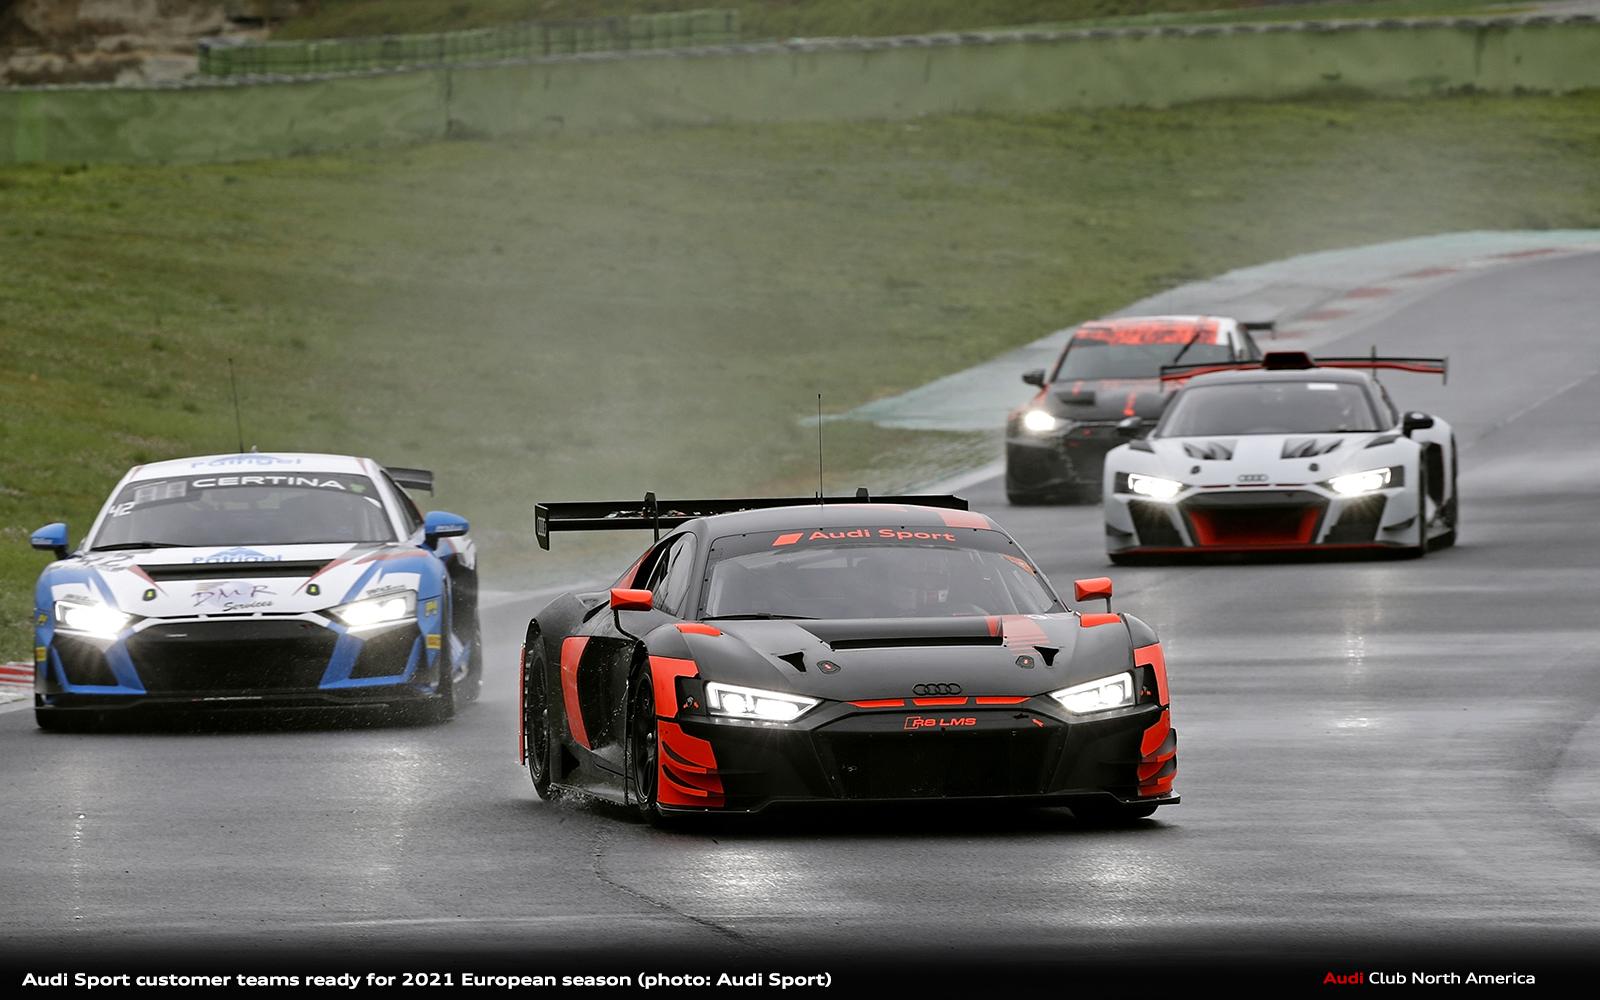 Audi Sport Customer Teams Ready for 2021 European Season